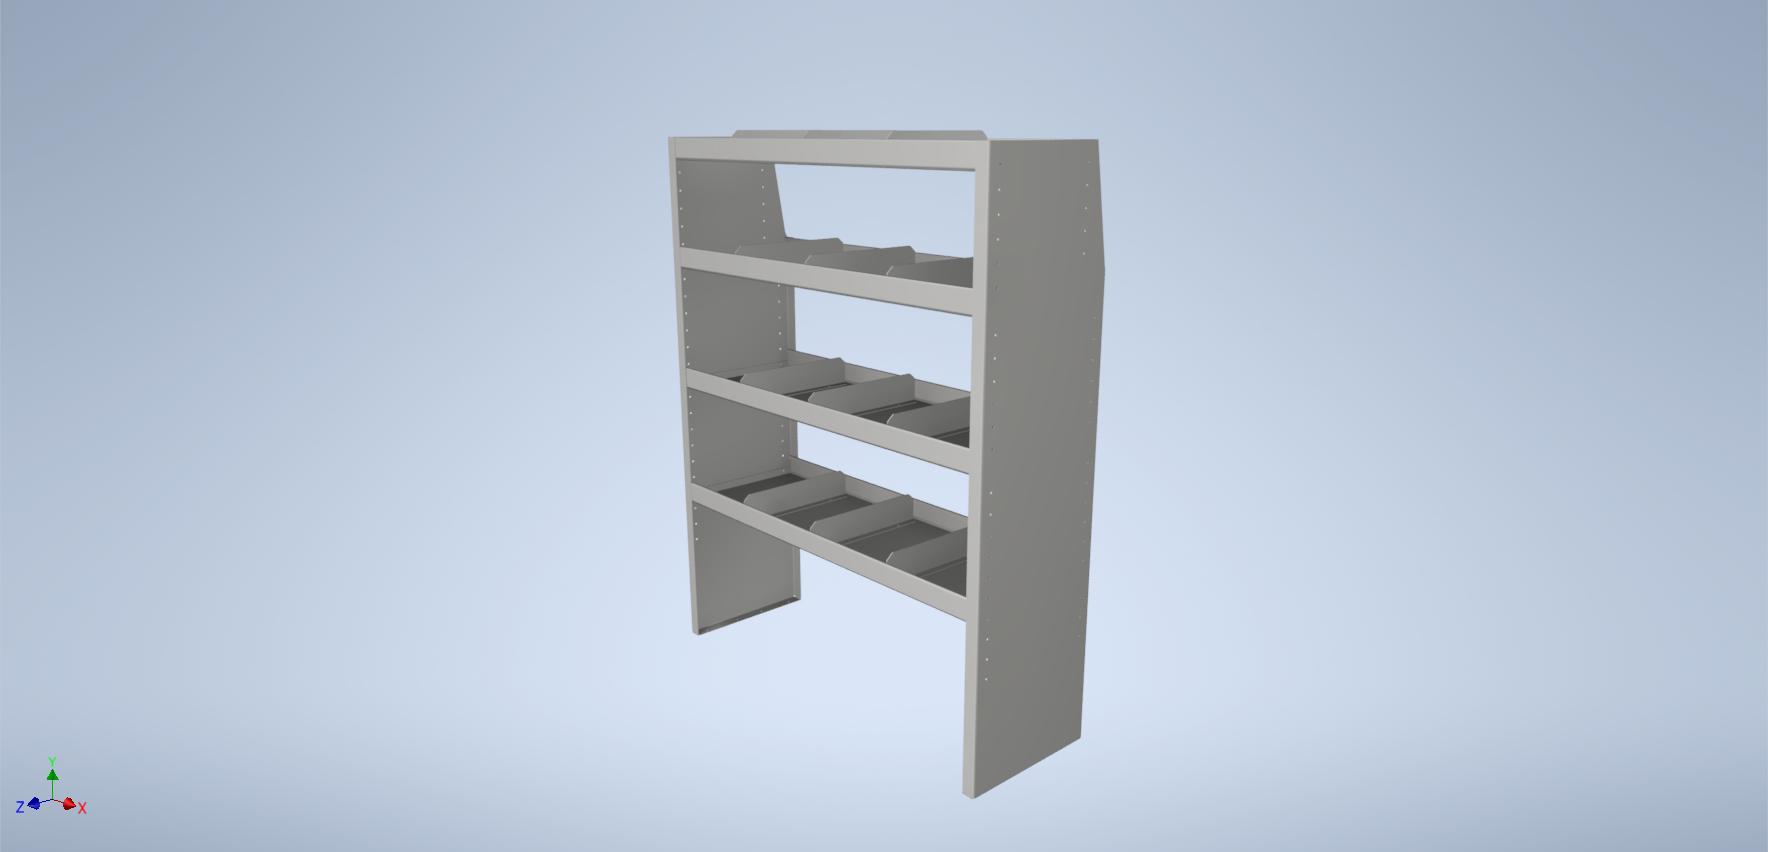 "48"" Long Aluminum Shelf Unit with Dividers"